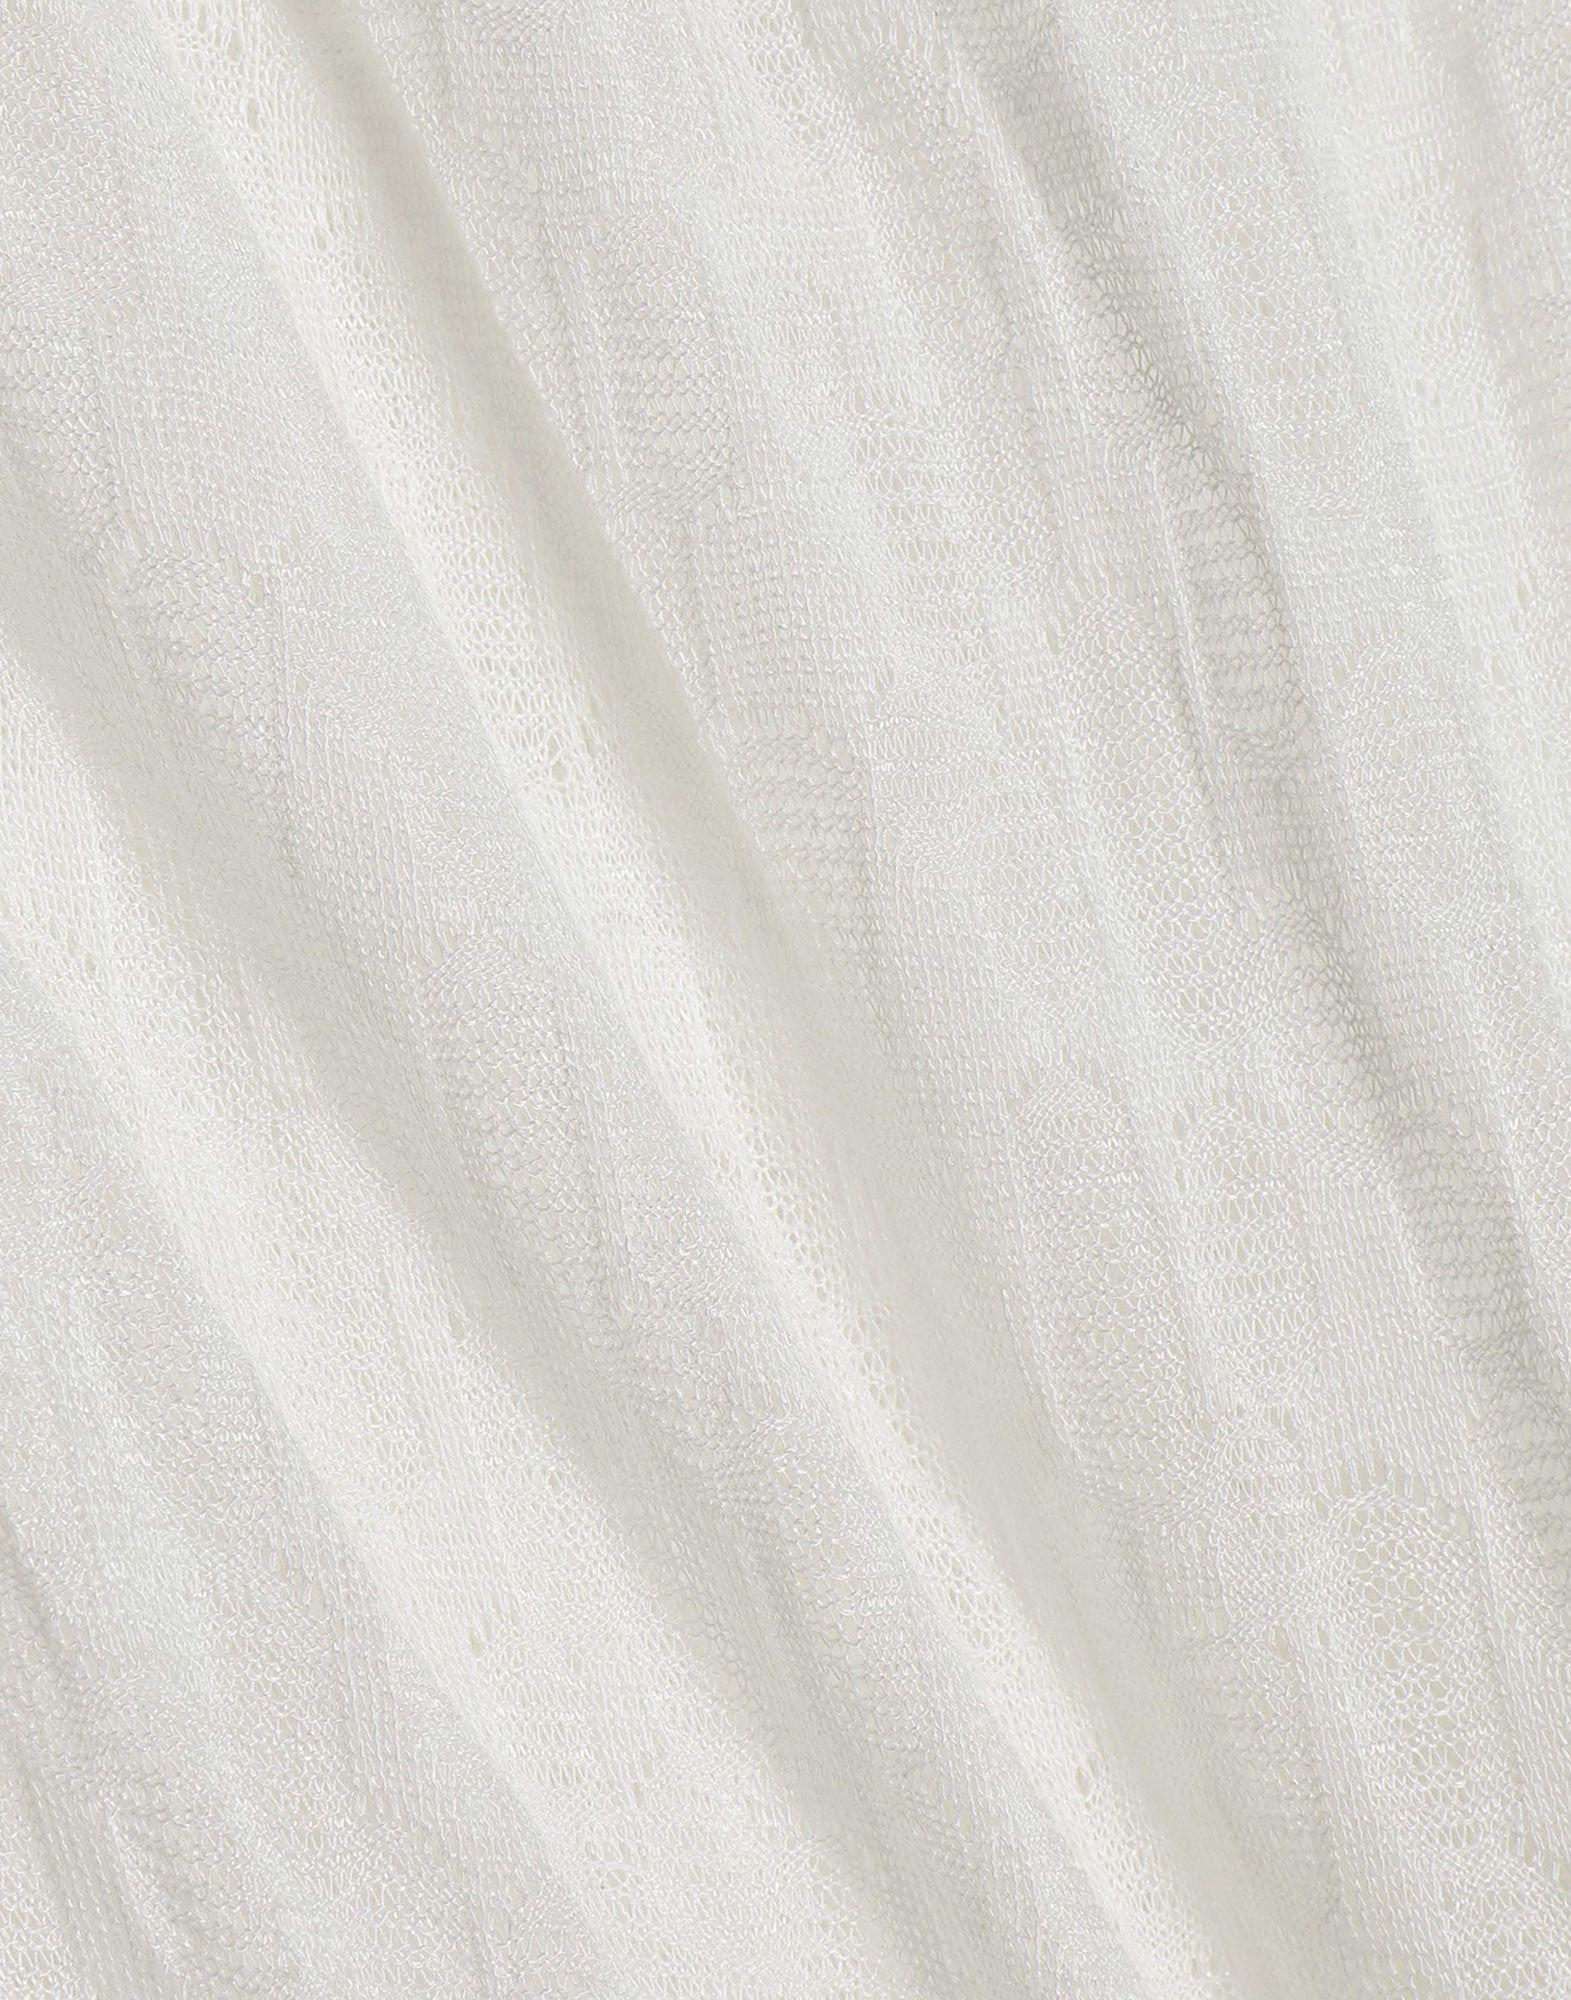 Combinaison Dentelle Melissa Odabash en coloris Blanc